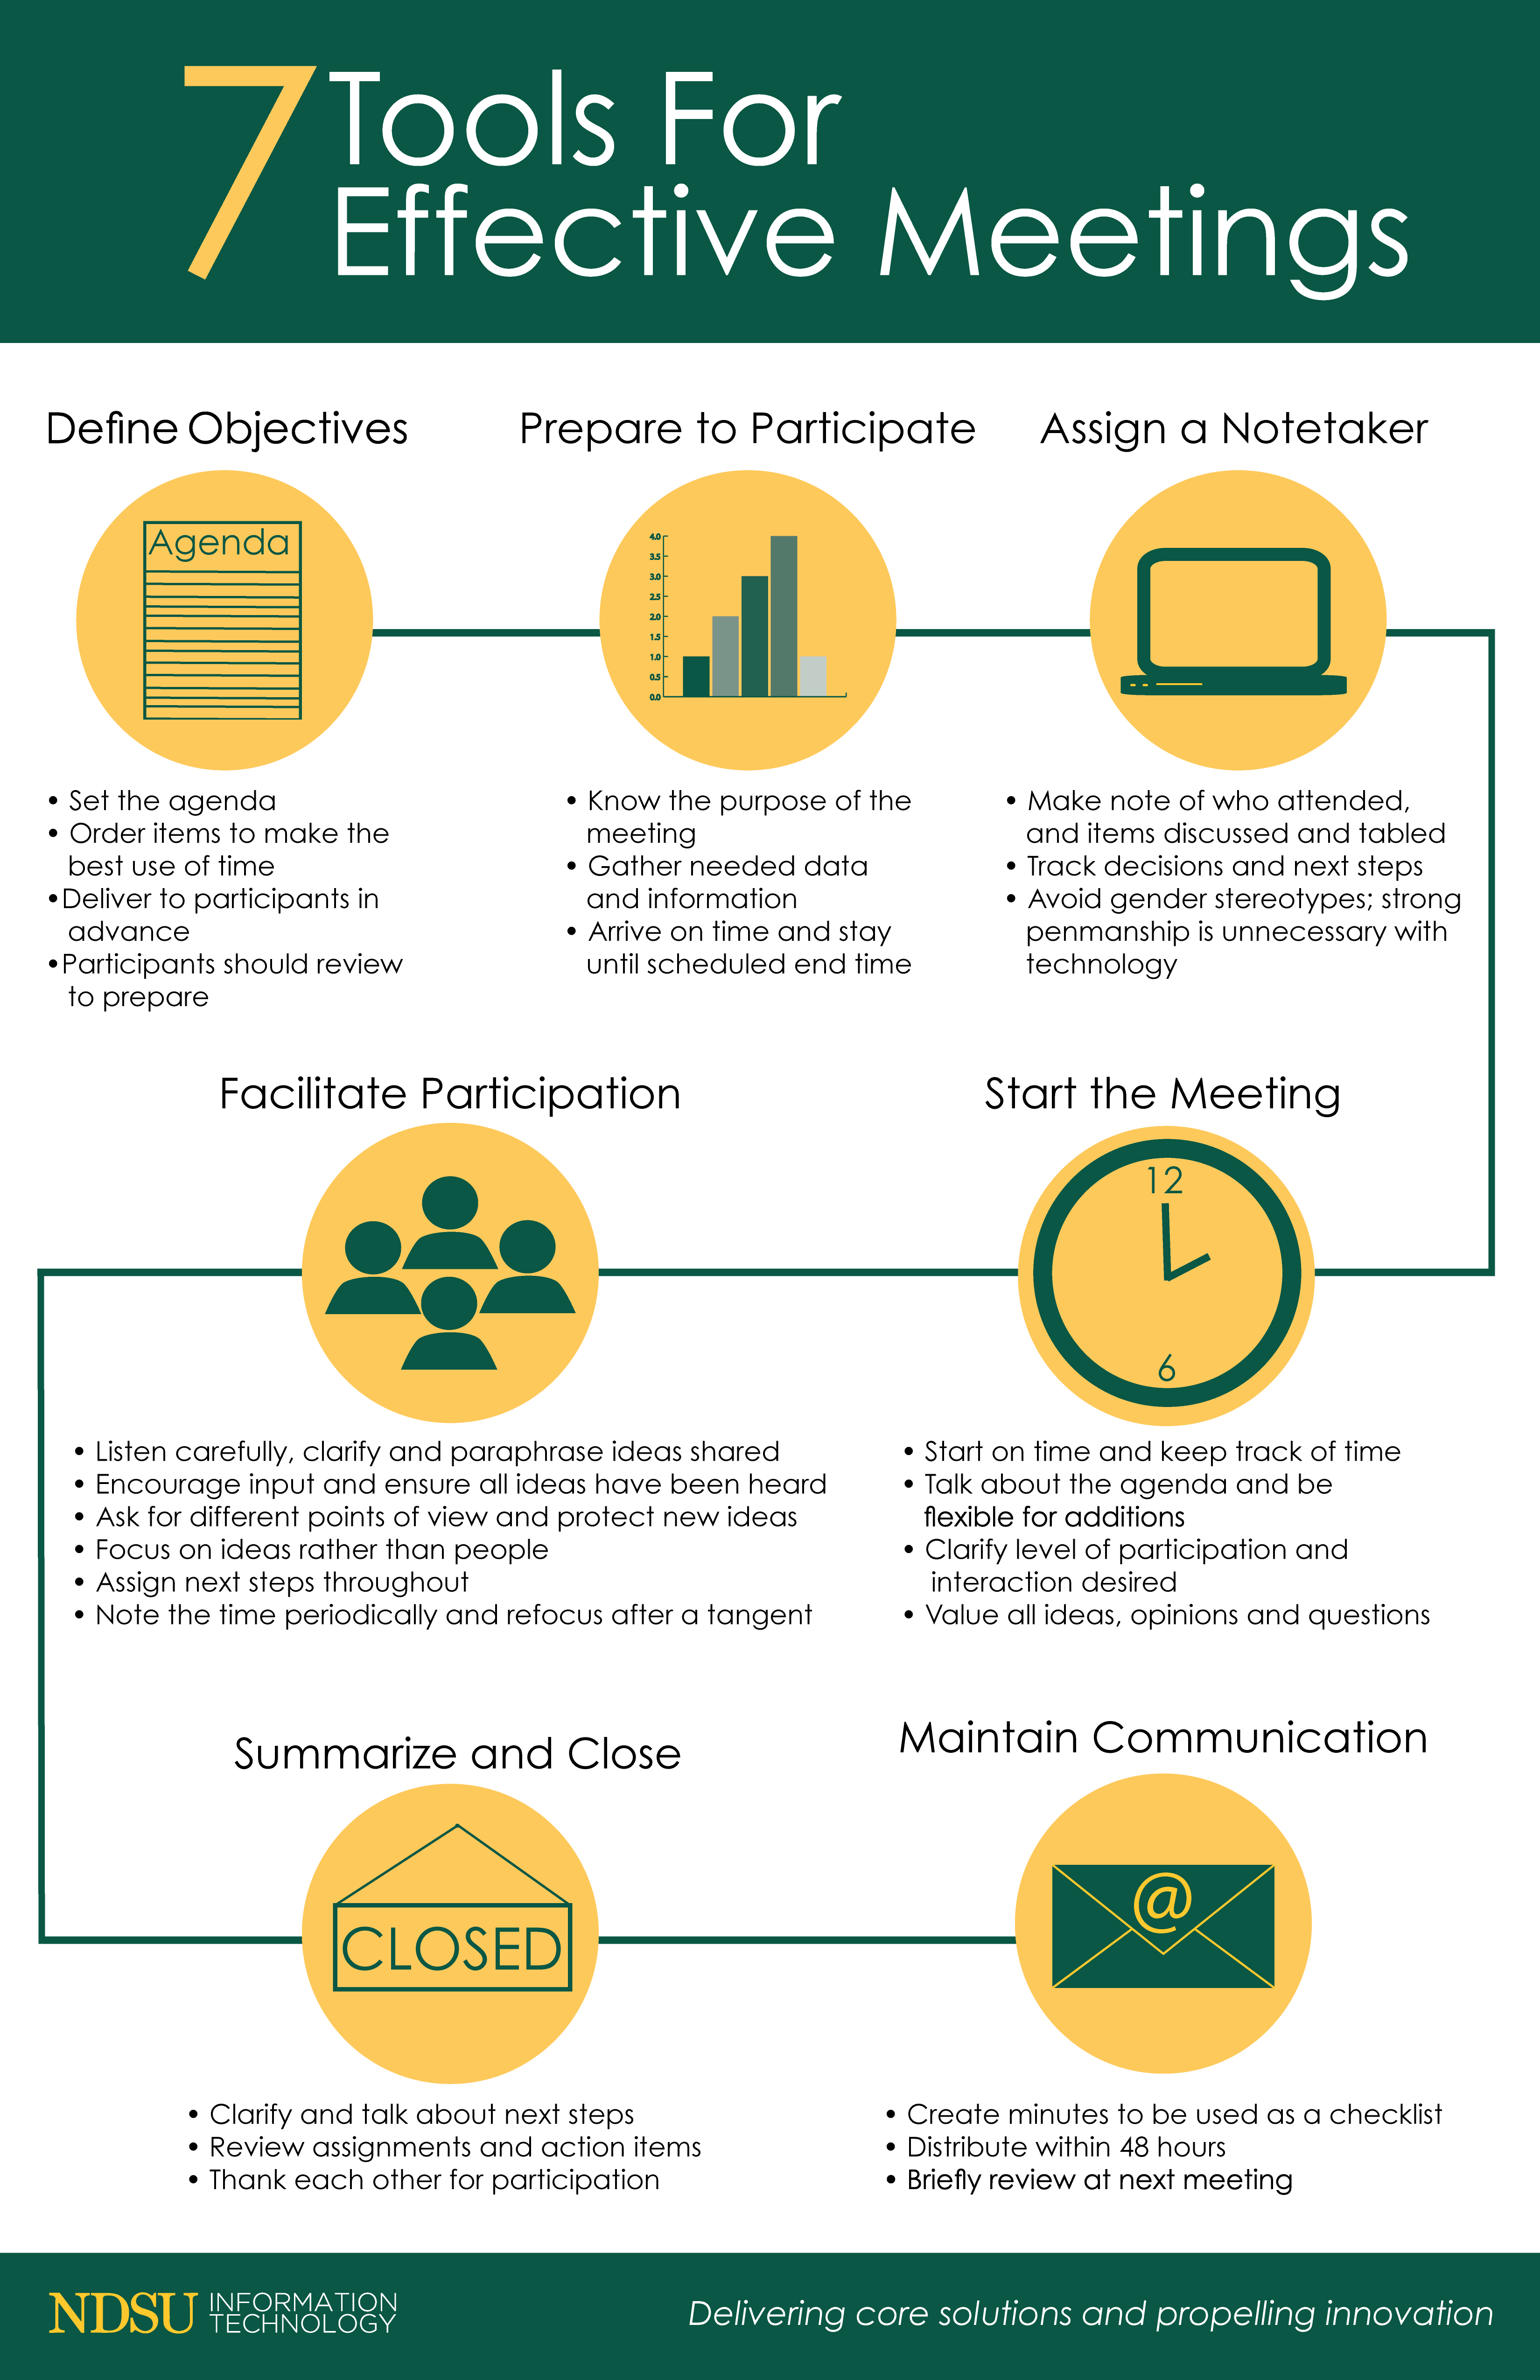 poster-infogrpahic-ndsu-it-effective-meetings